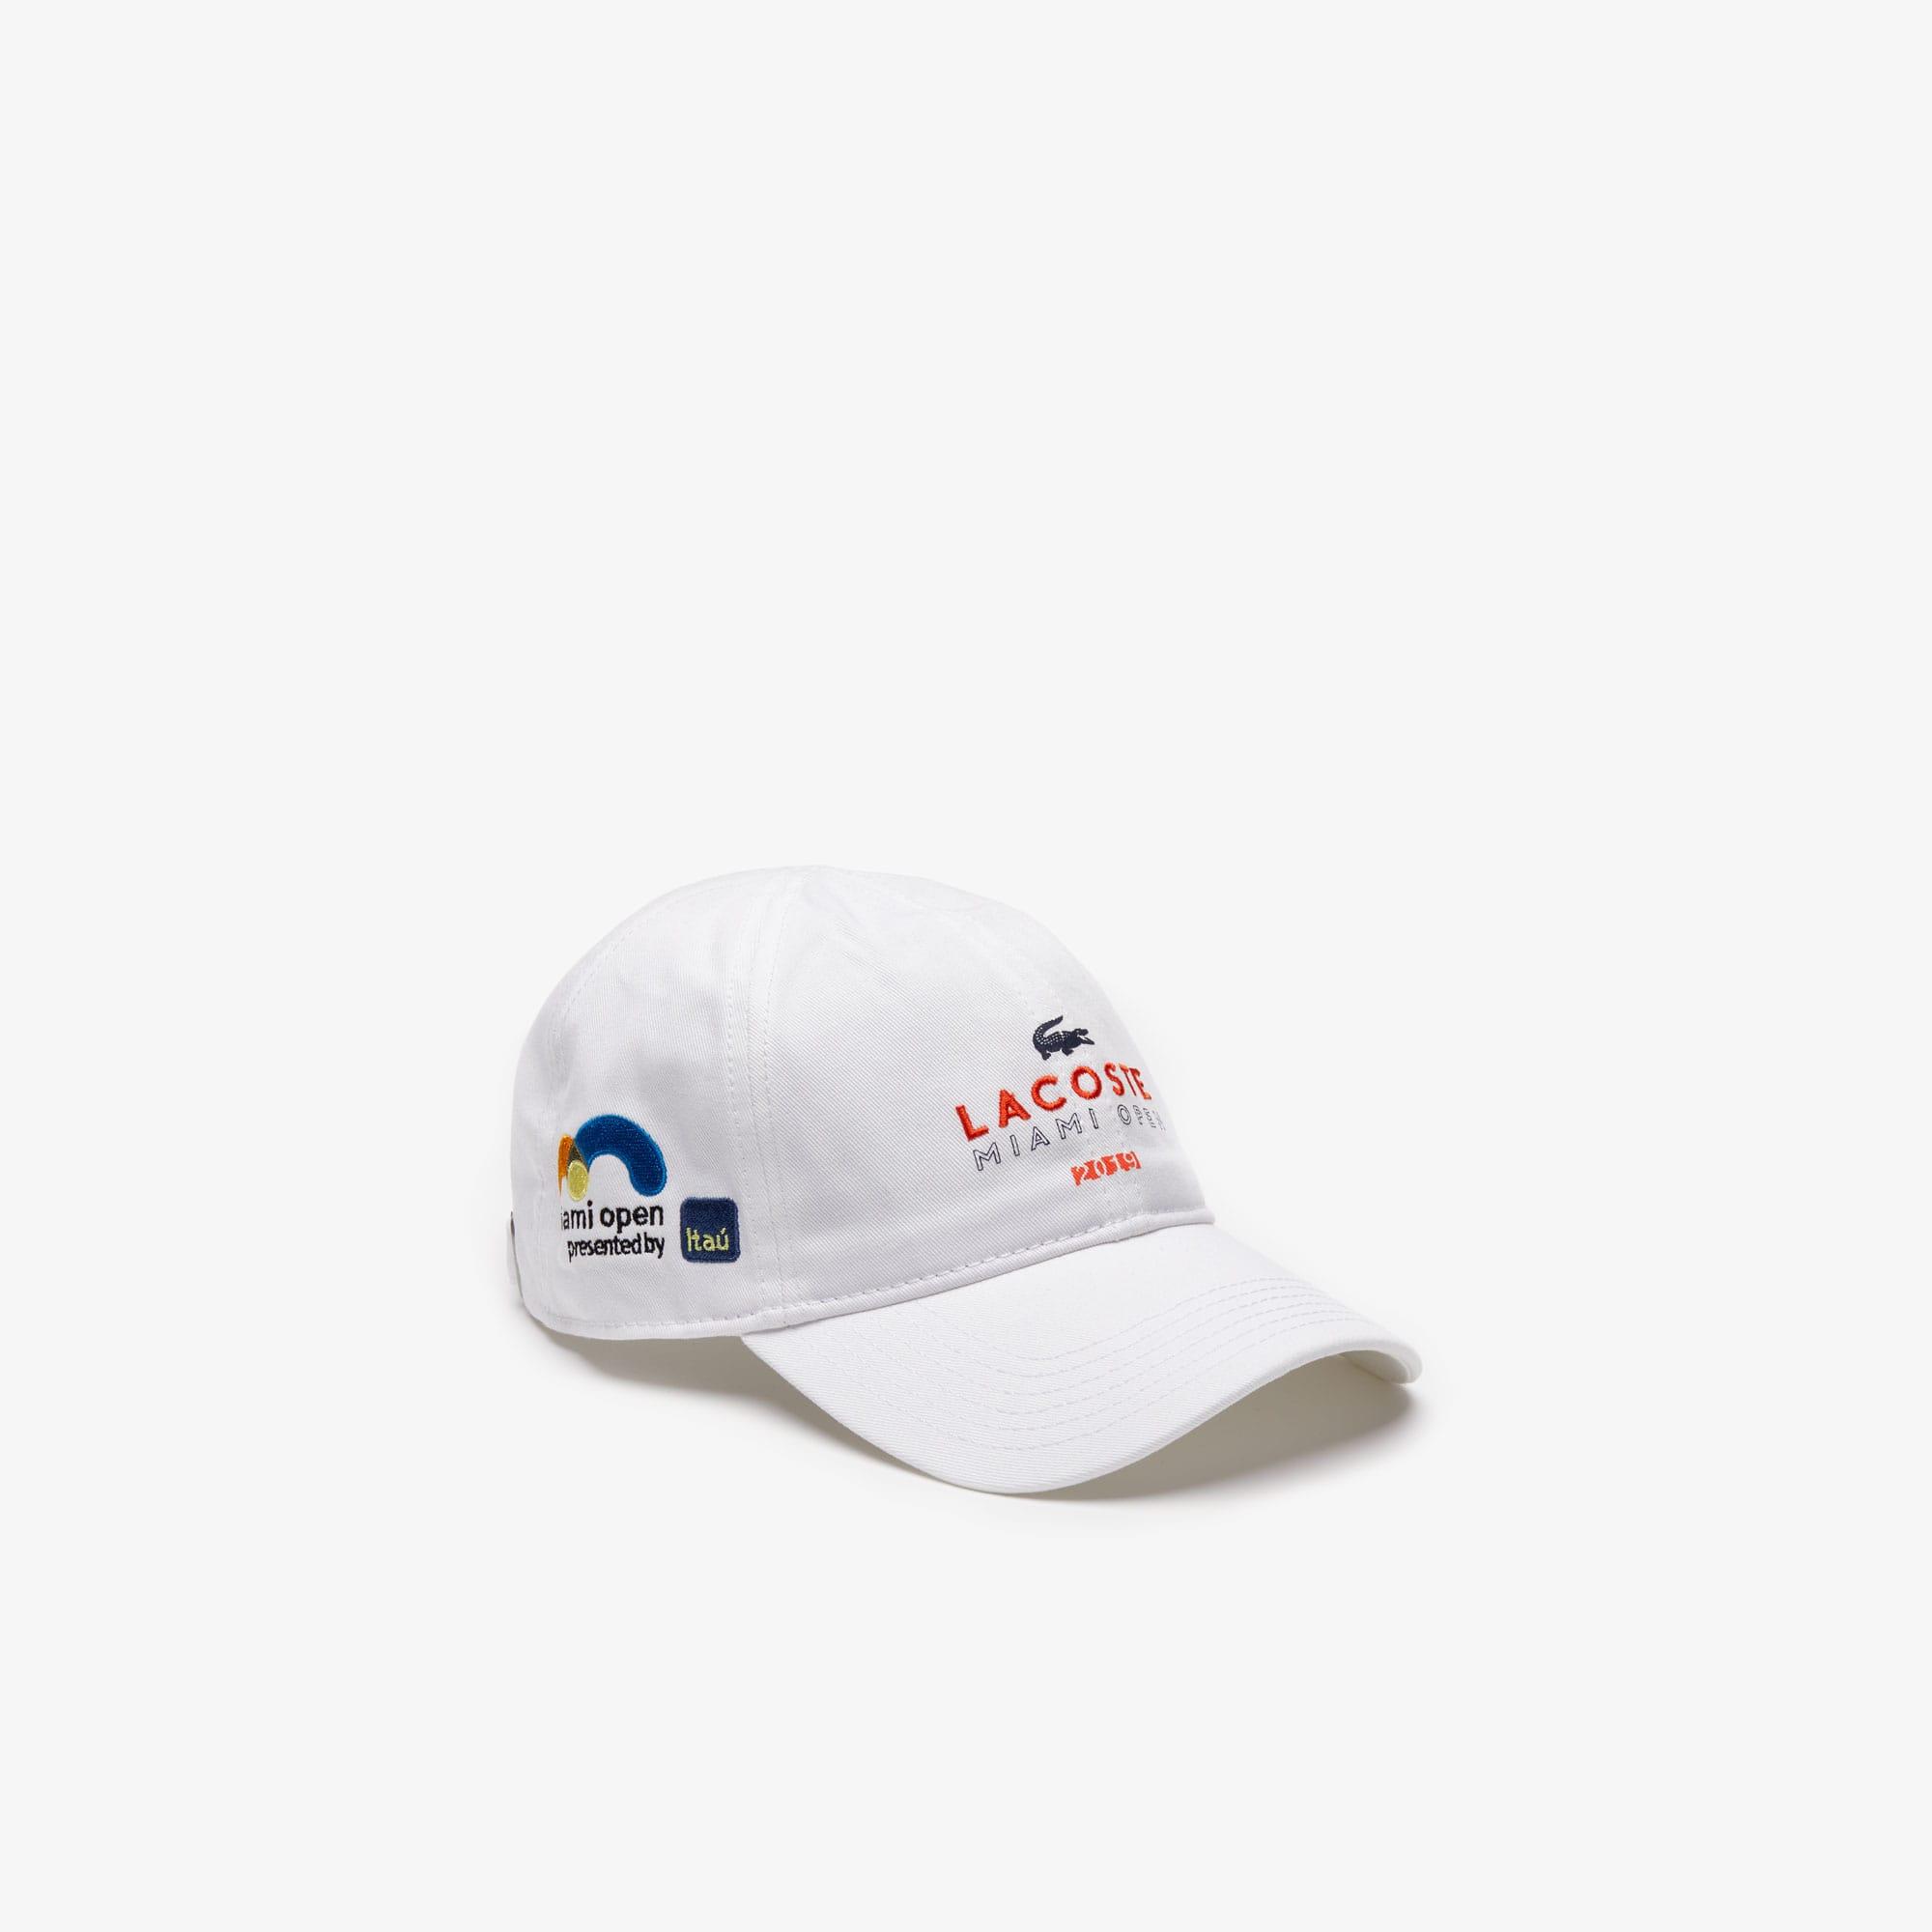 31231b7078b Lacoste Men's Sport Miami Open Edition Cap In White / Orange / Navy Blue